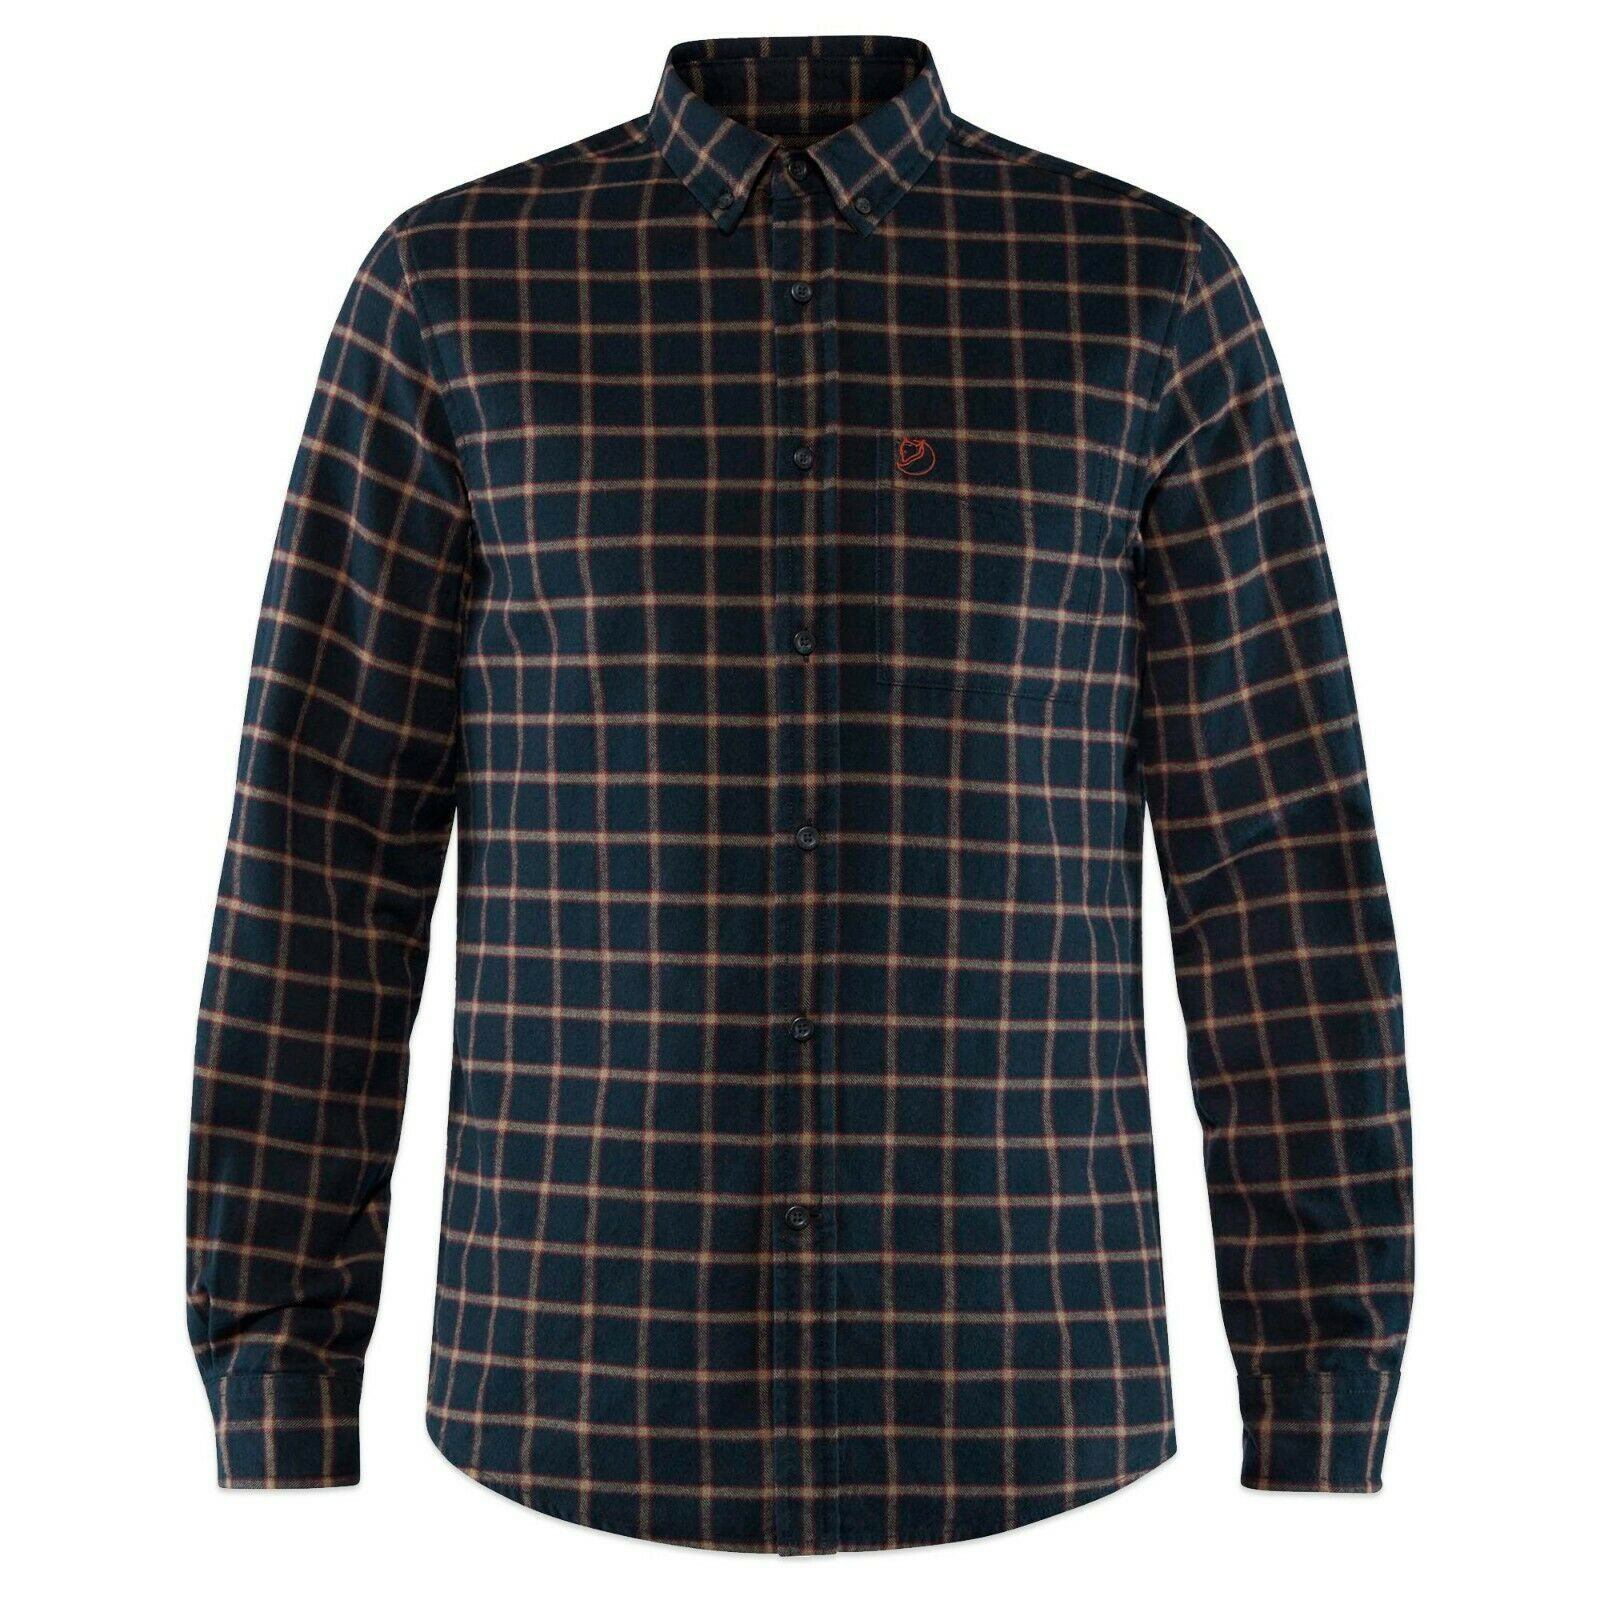 Fjallraven Shirts - Fjallraven Ovik Flannel Long Sleeve Check Shirt - Dark Navy